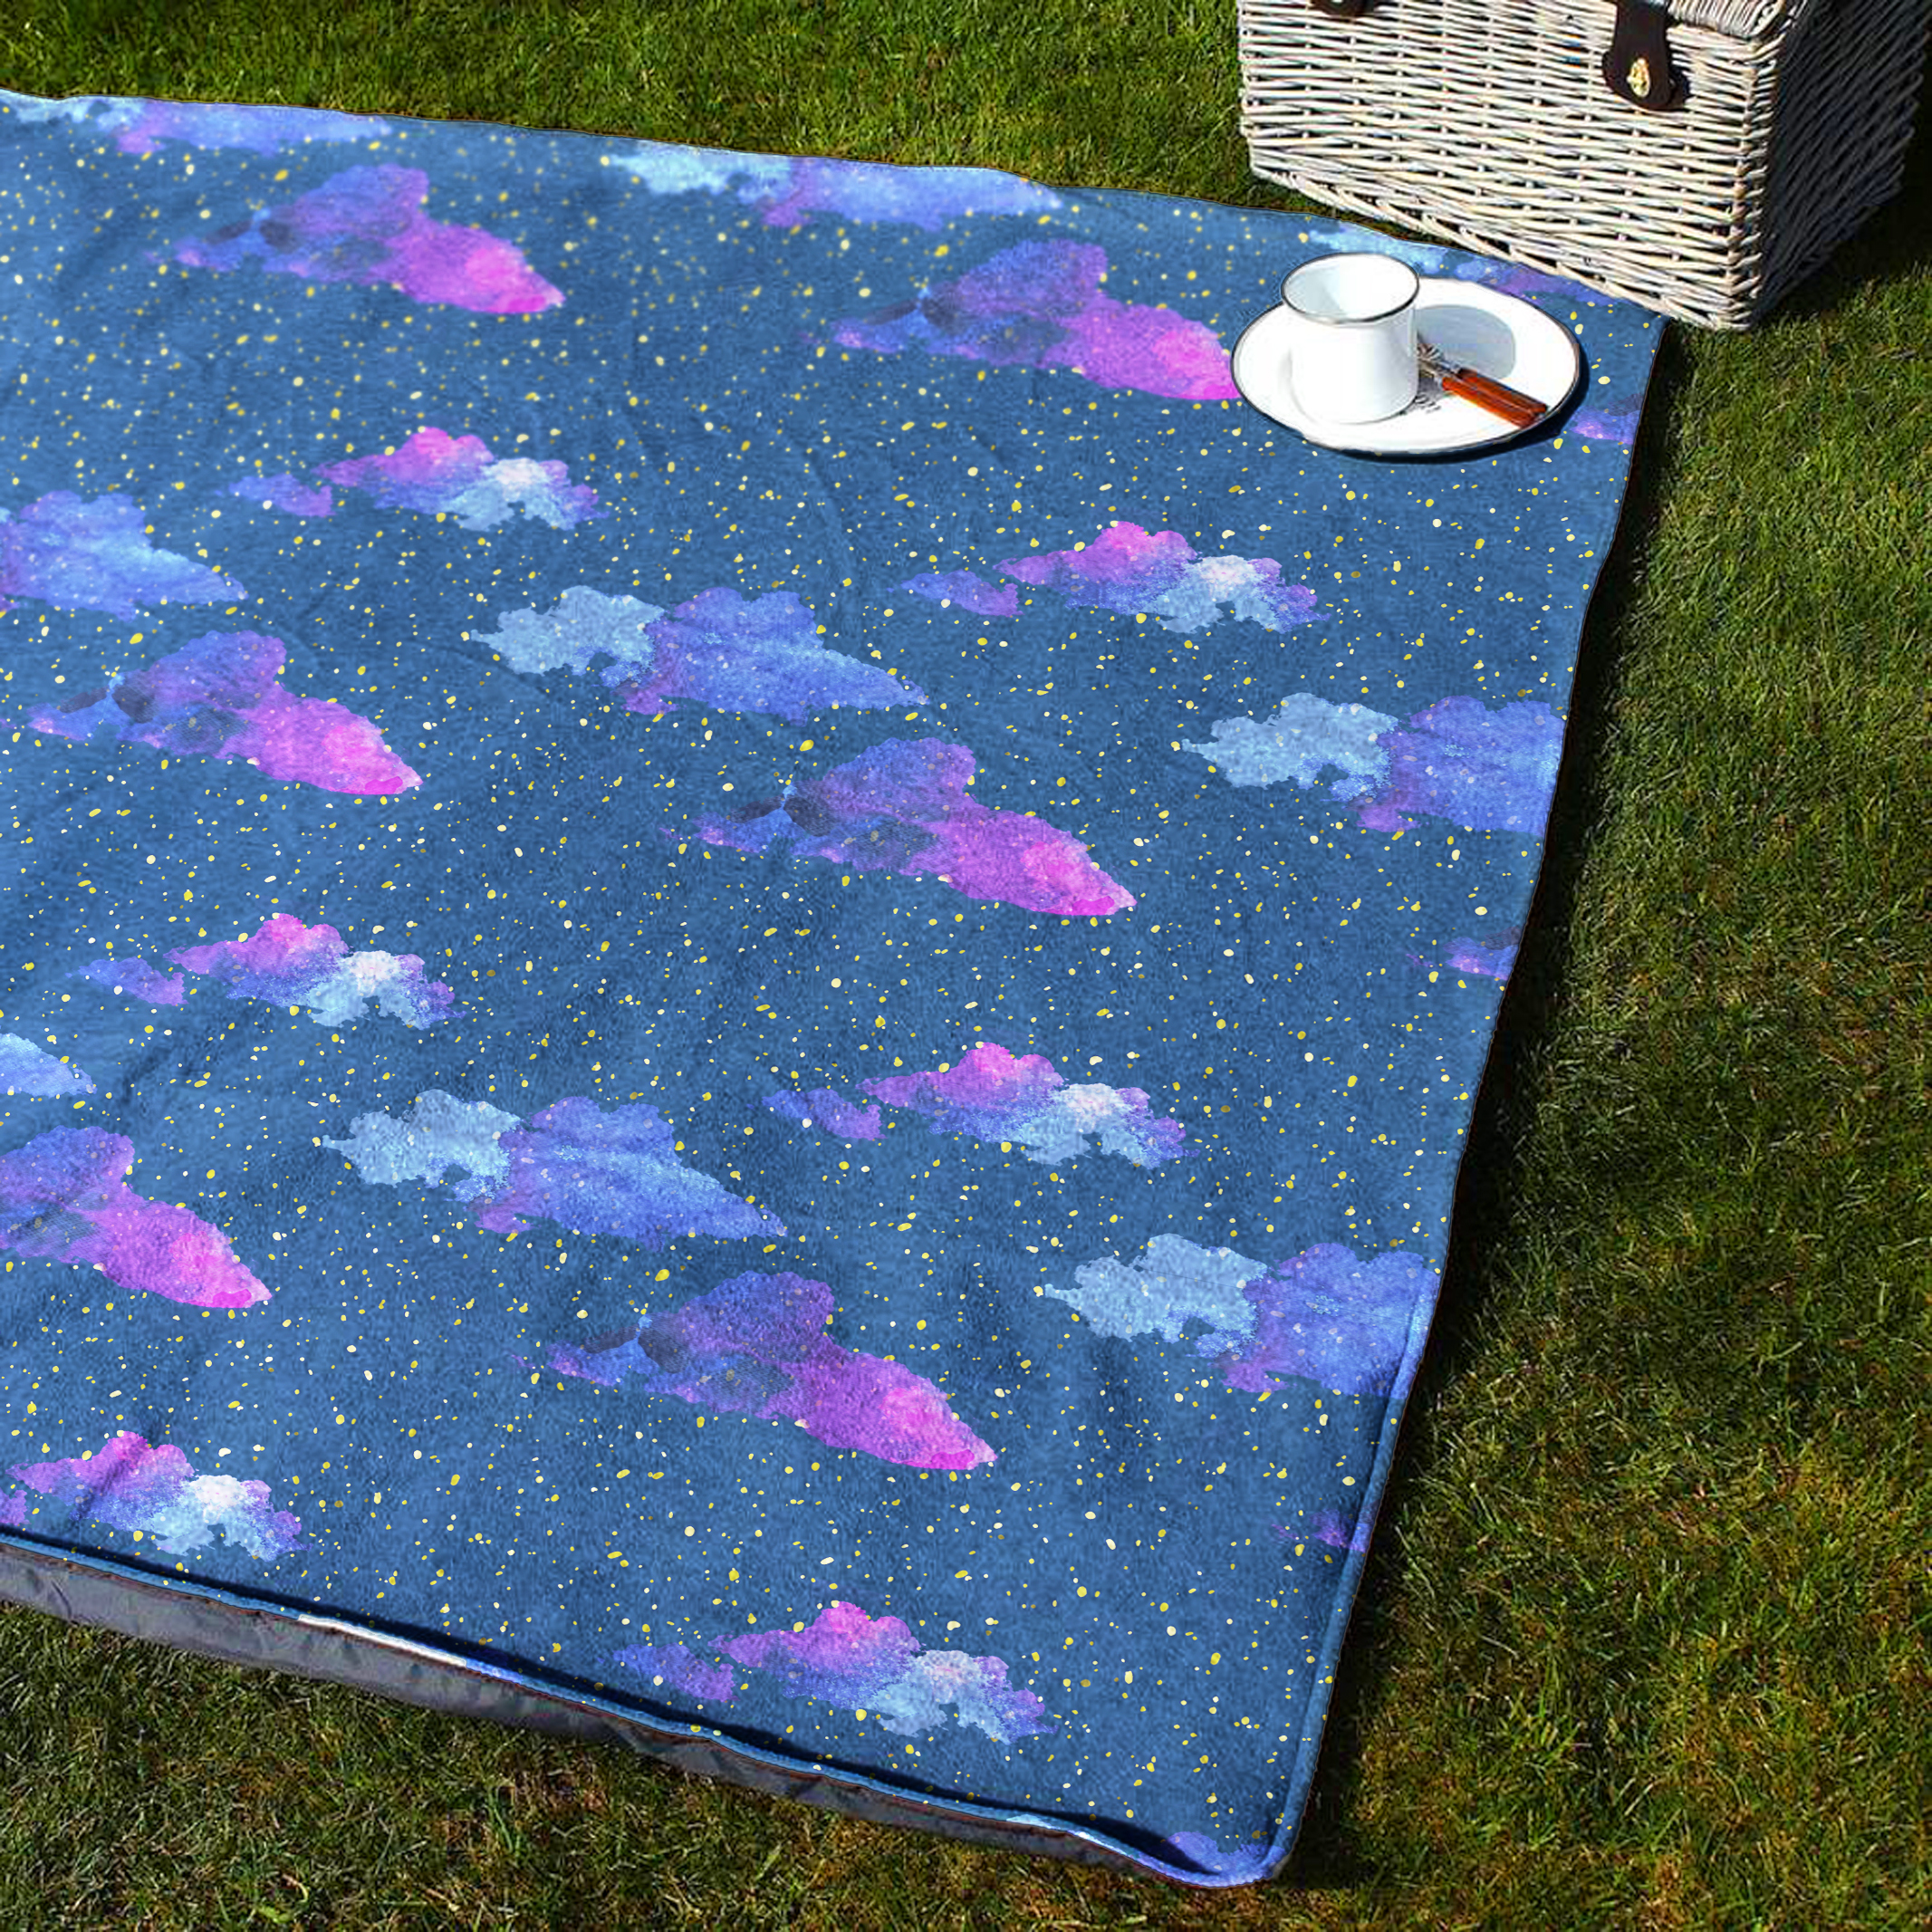 The Stars Picnic Blanket